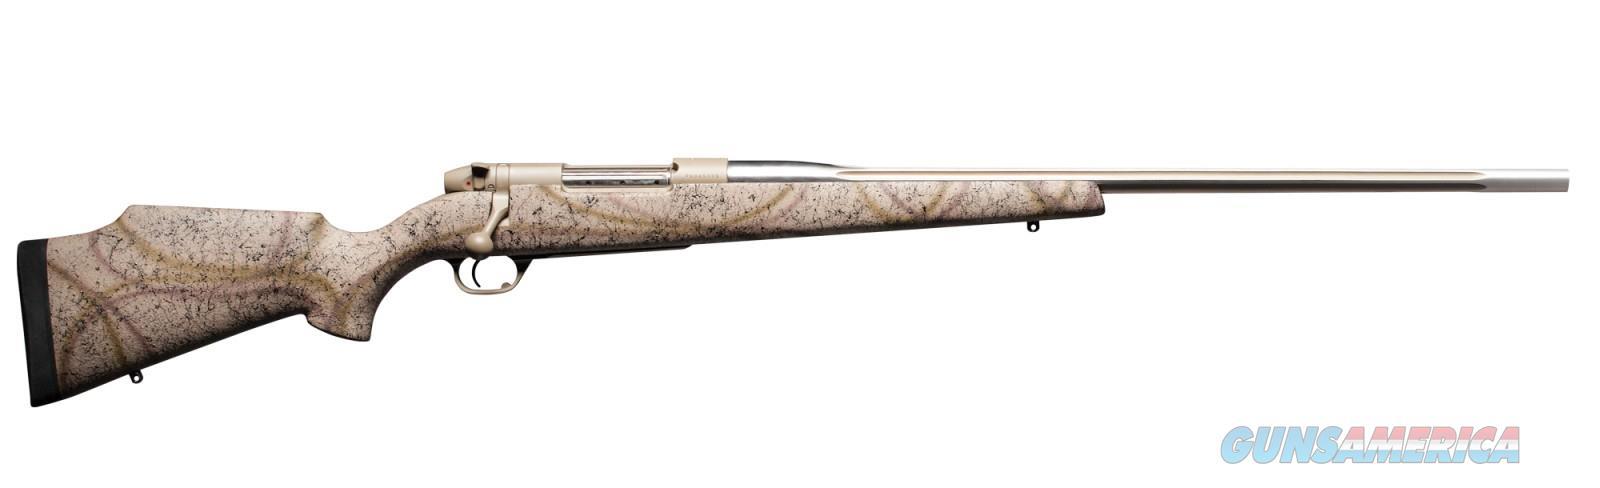 "Weatherby Mark V Terramark 6.5 Creedmoor 24"" MATS65CMR4O   Guns > Rifles > Weatherby Rifles > Sporting"